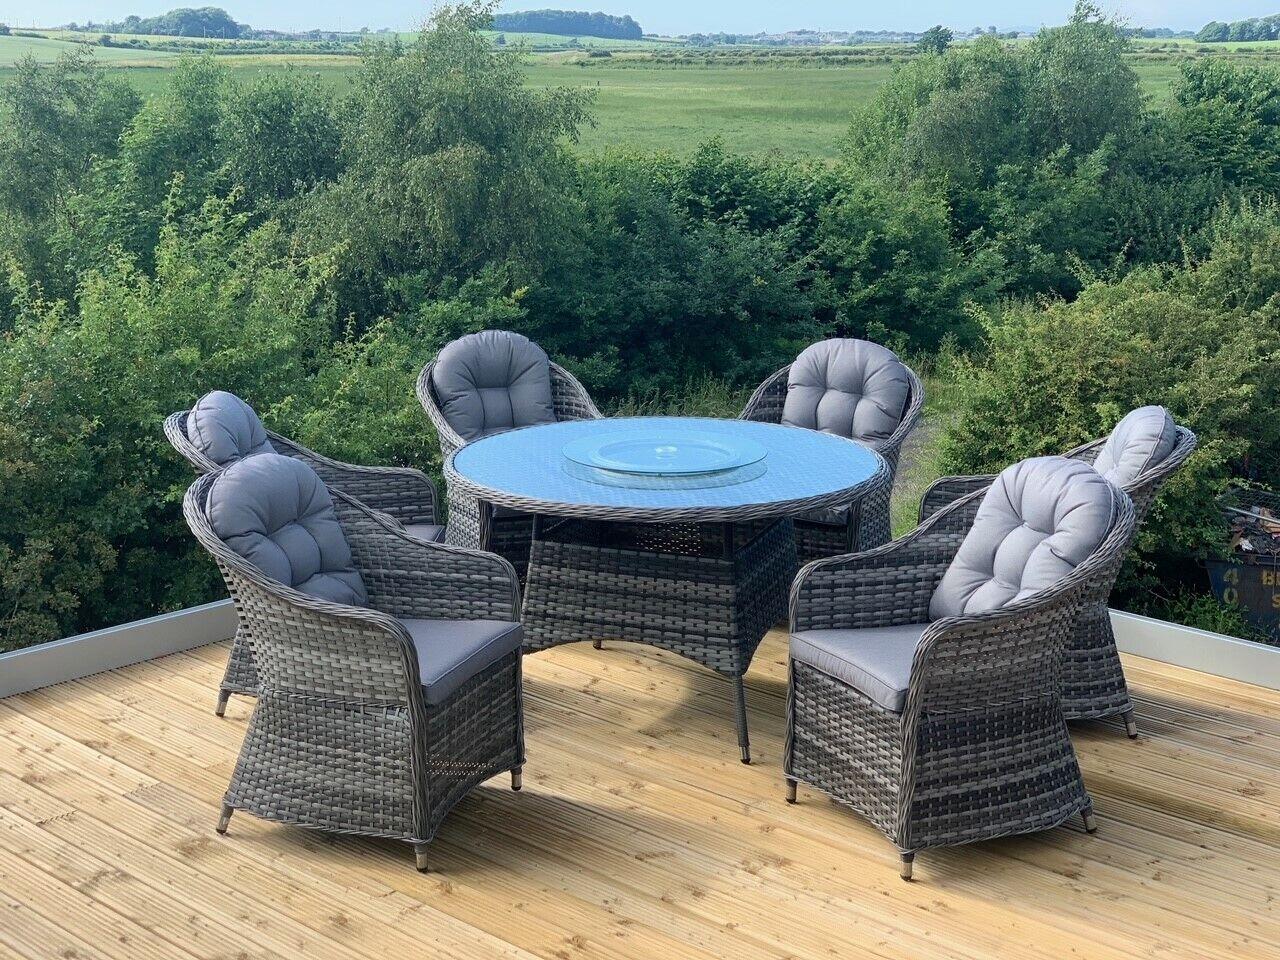 Garden Furniture - Florida Aluminium Rattan Garden Furniture 4/6 Seat, High Quality 5 Year Warranty